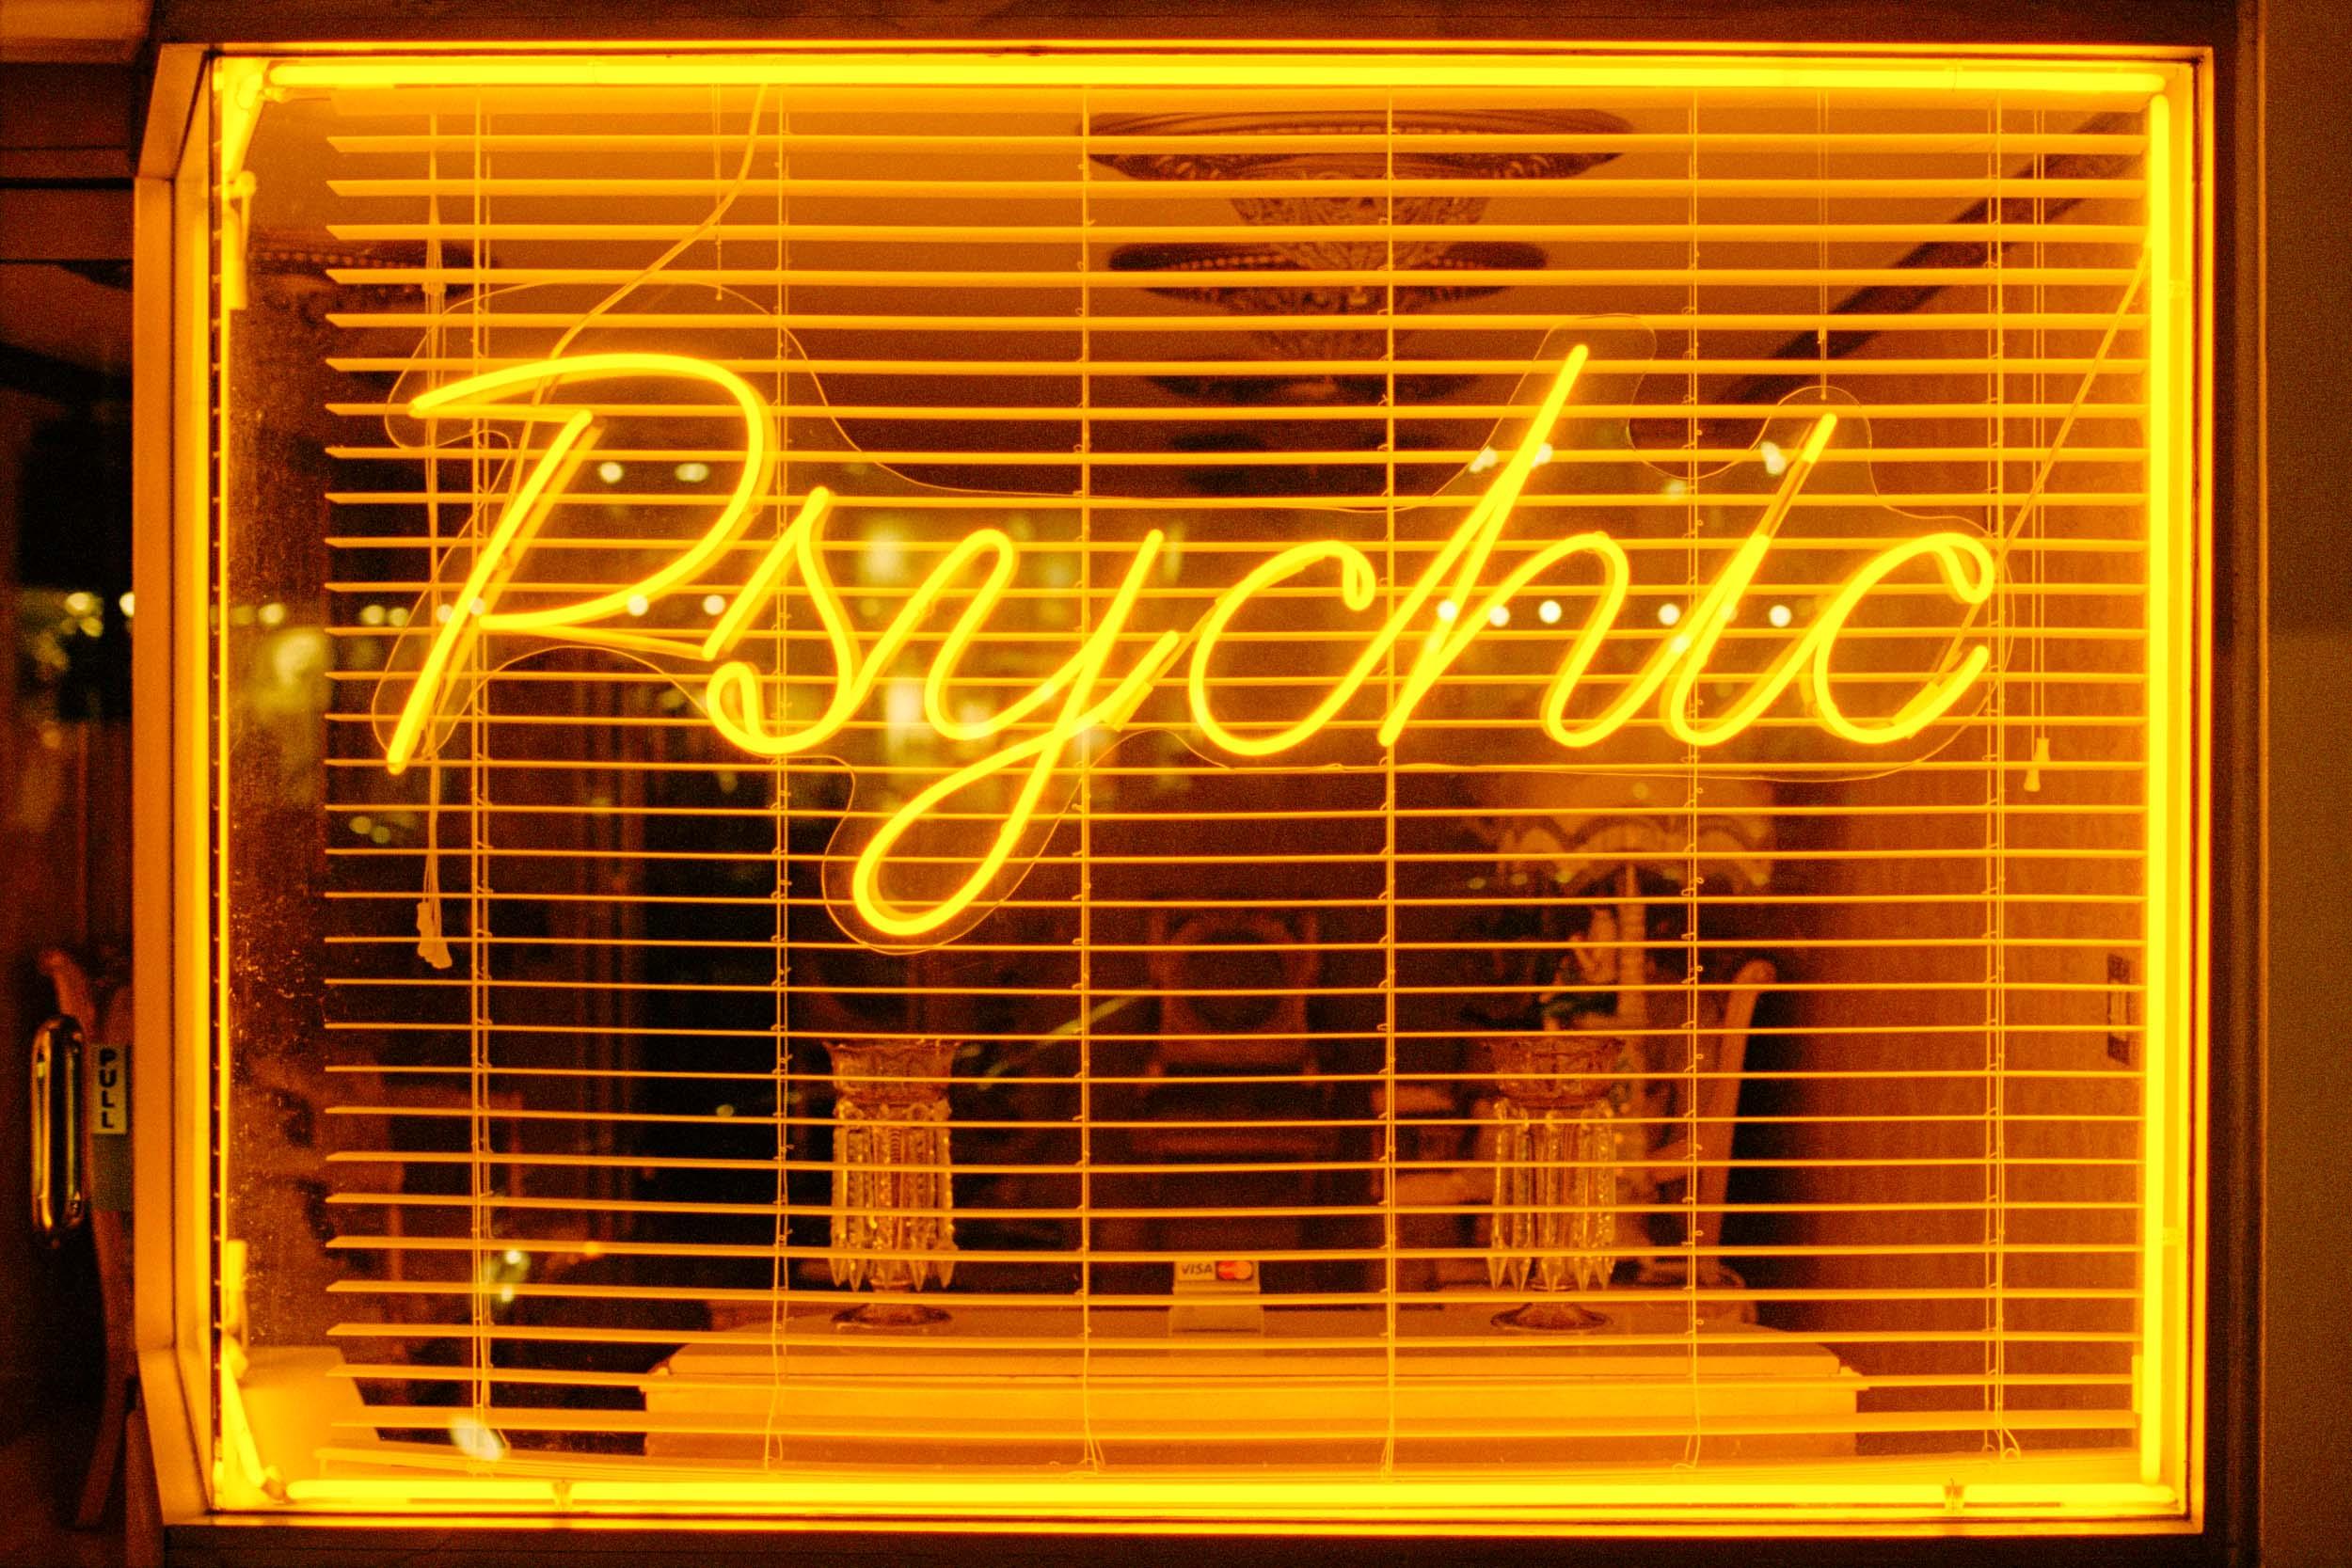 17Psychic RT_documentary photographer, documentary scotland, freelance photographer, photographer edinburgh, photographer scotland, glasgow, mat hay, photographer london, L.A., california, los angelese, london, sunset strip, sunset boulevard.jpg